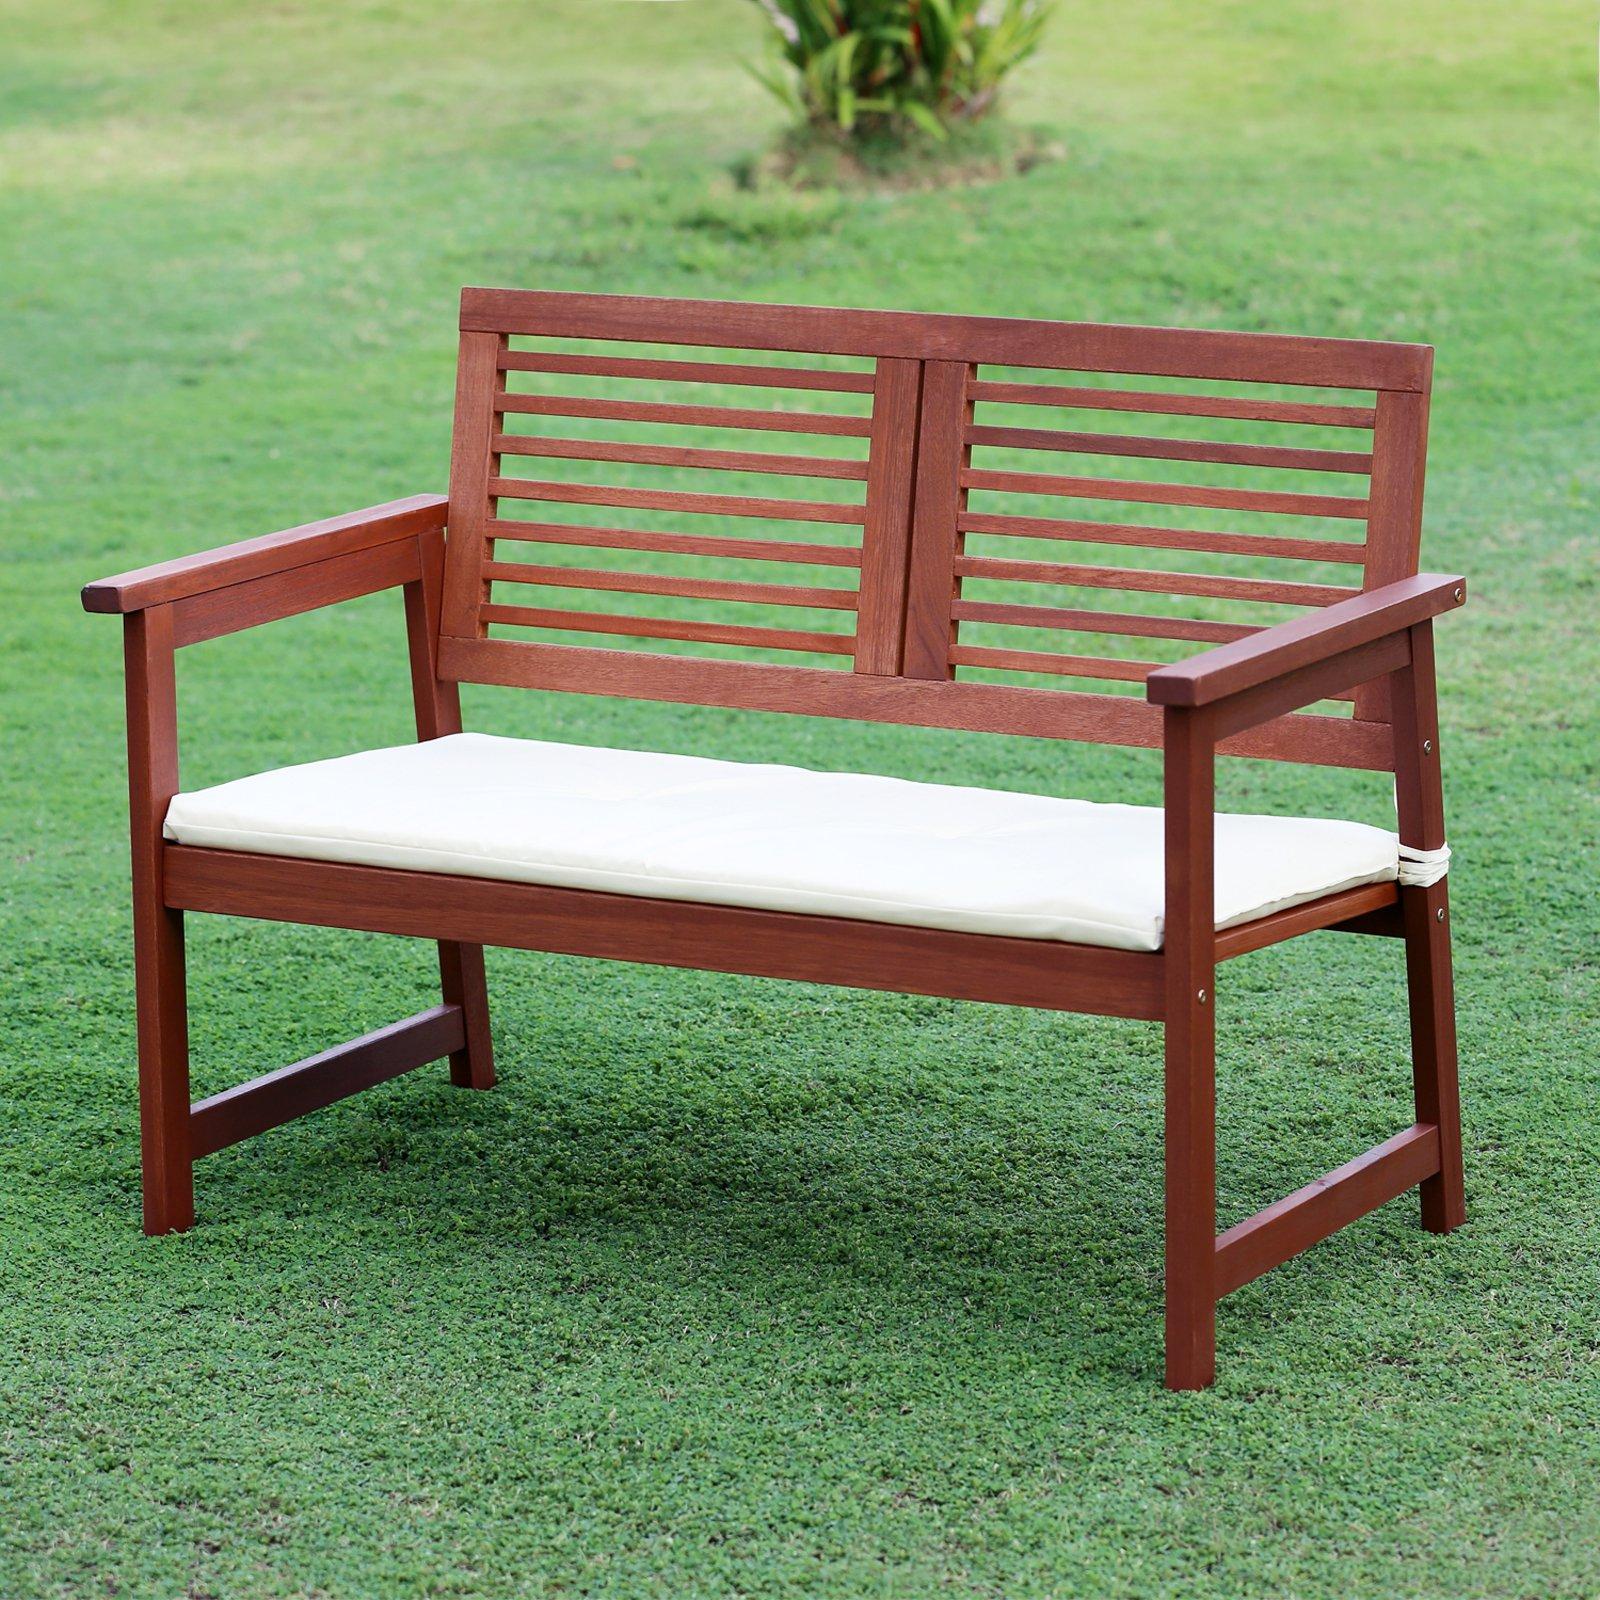 Furinno Tioman Hardwood Outdoor Bench with Cushion